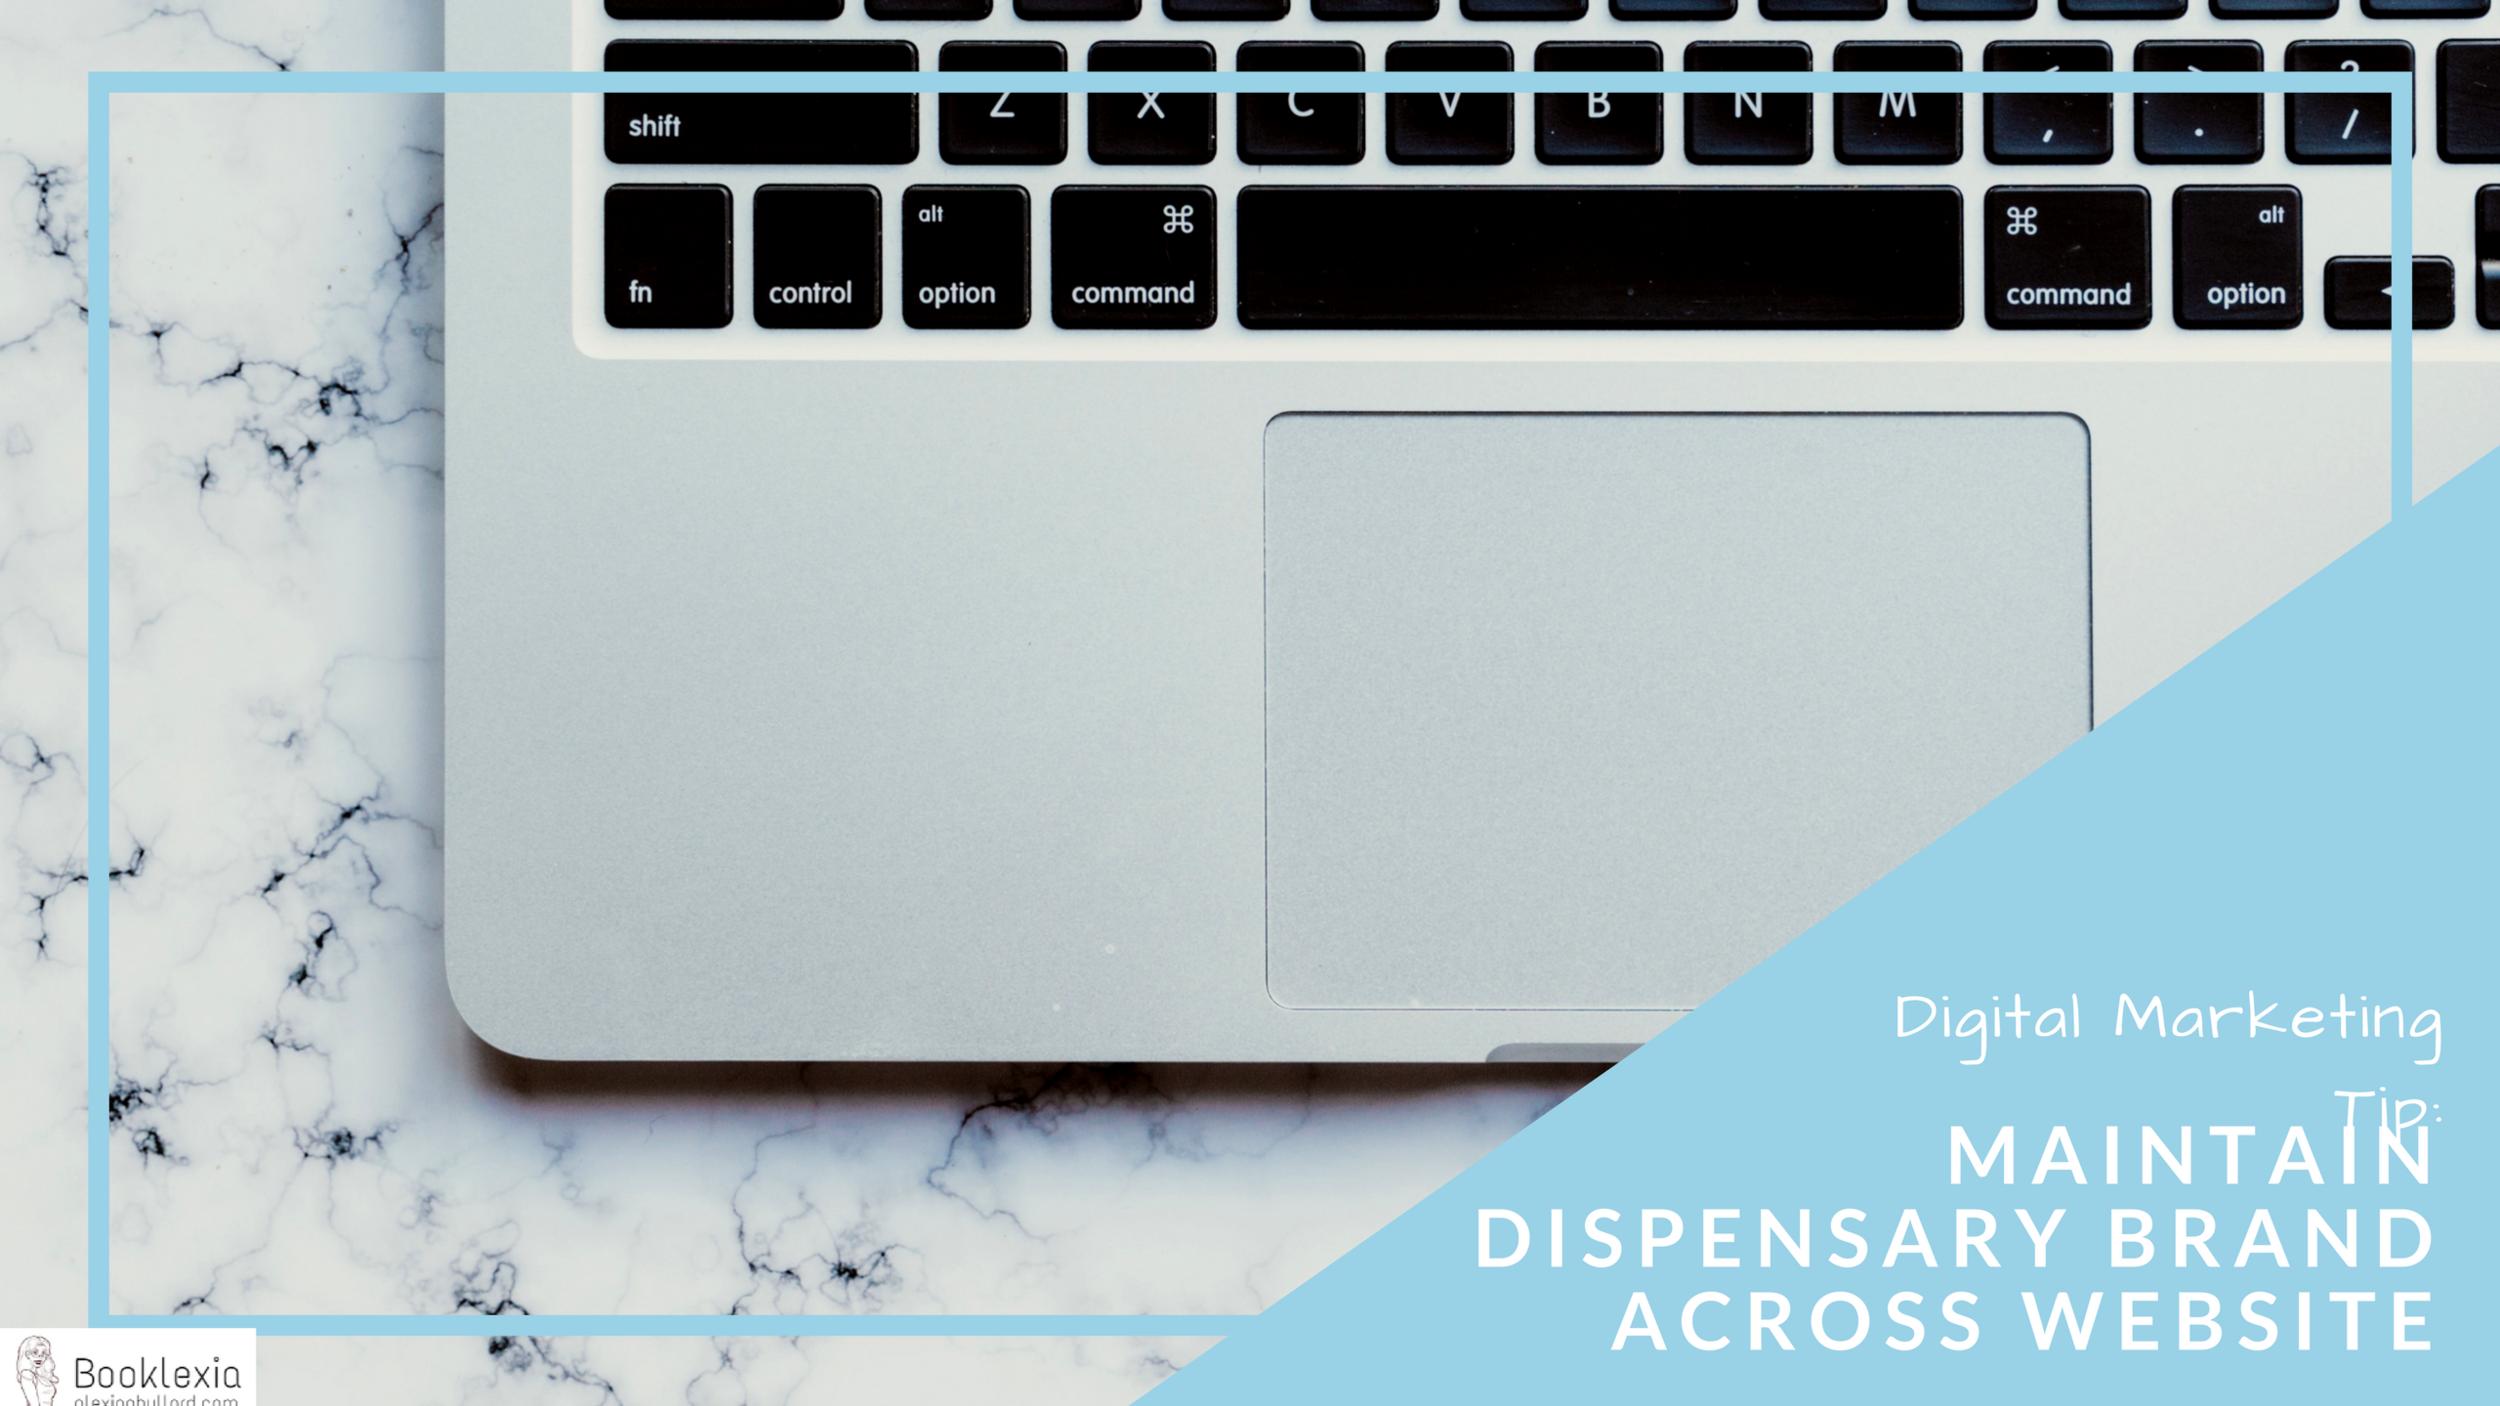 Digital Marketing Tips for Dispensaries   Maintain Dispensary Branding Across Website    alexiapbullard.com